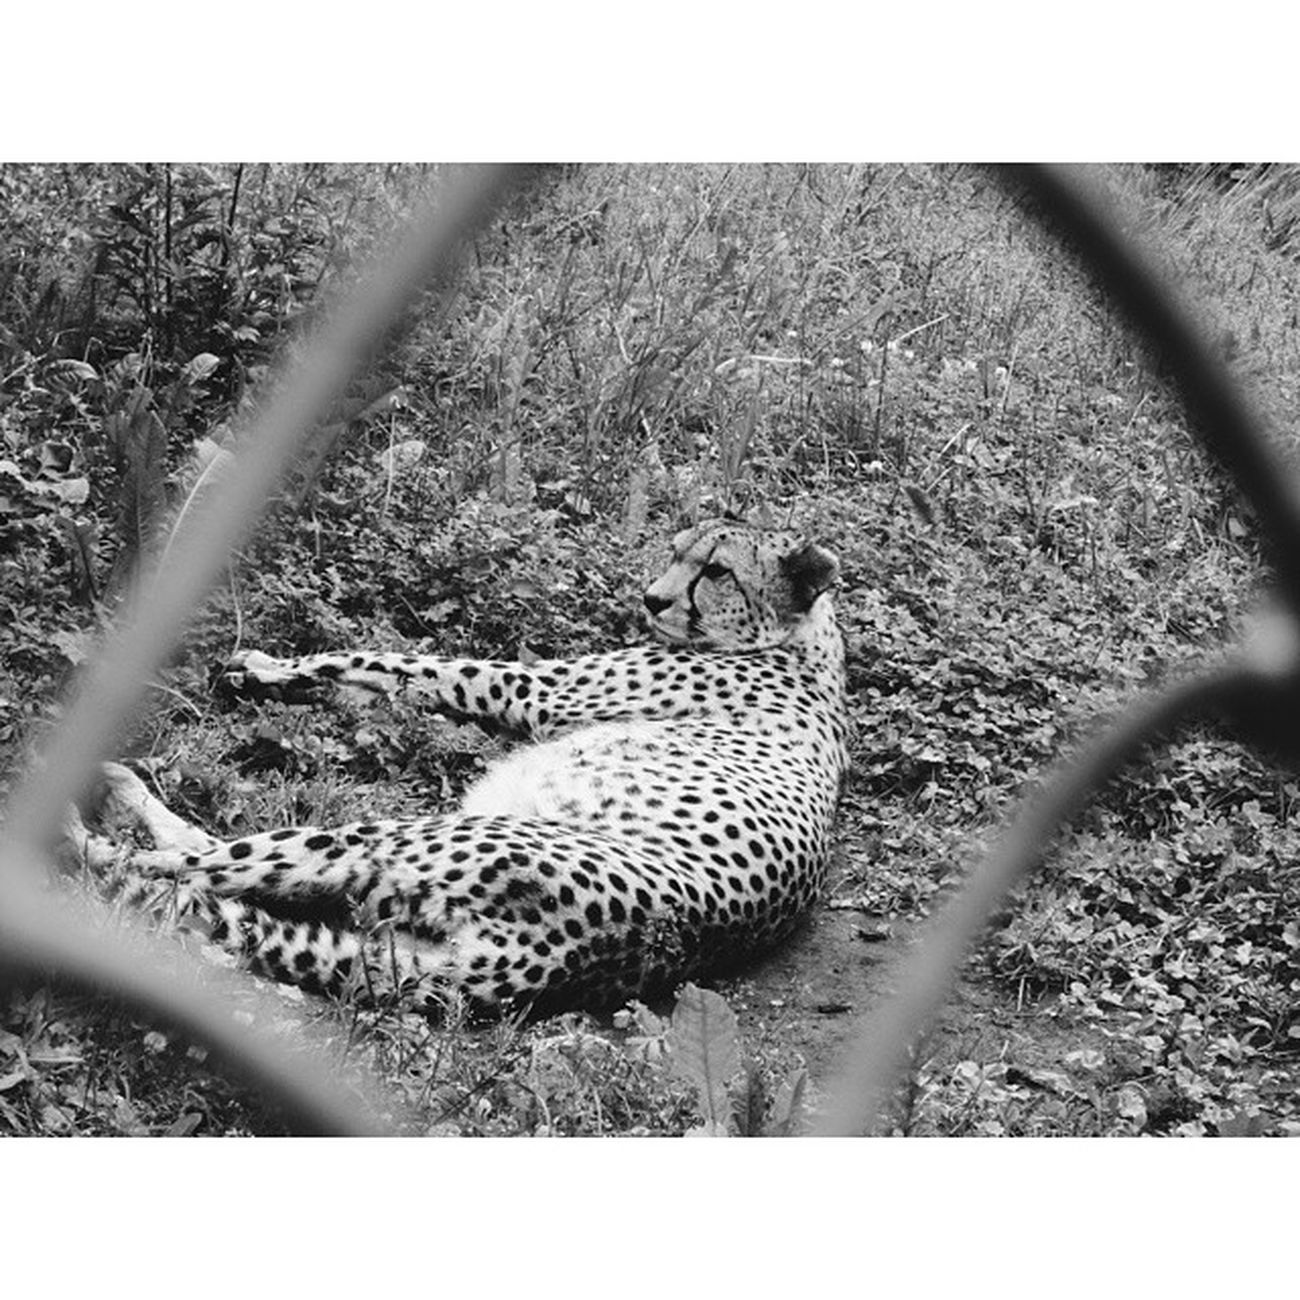 гепард кошка хищник зоопарк Охотник вклетке скорость лето жара Cheetah Cat Predator Zoo Hunter Inthecell Speed Summer Heat Monochrome Instasize